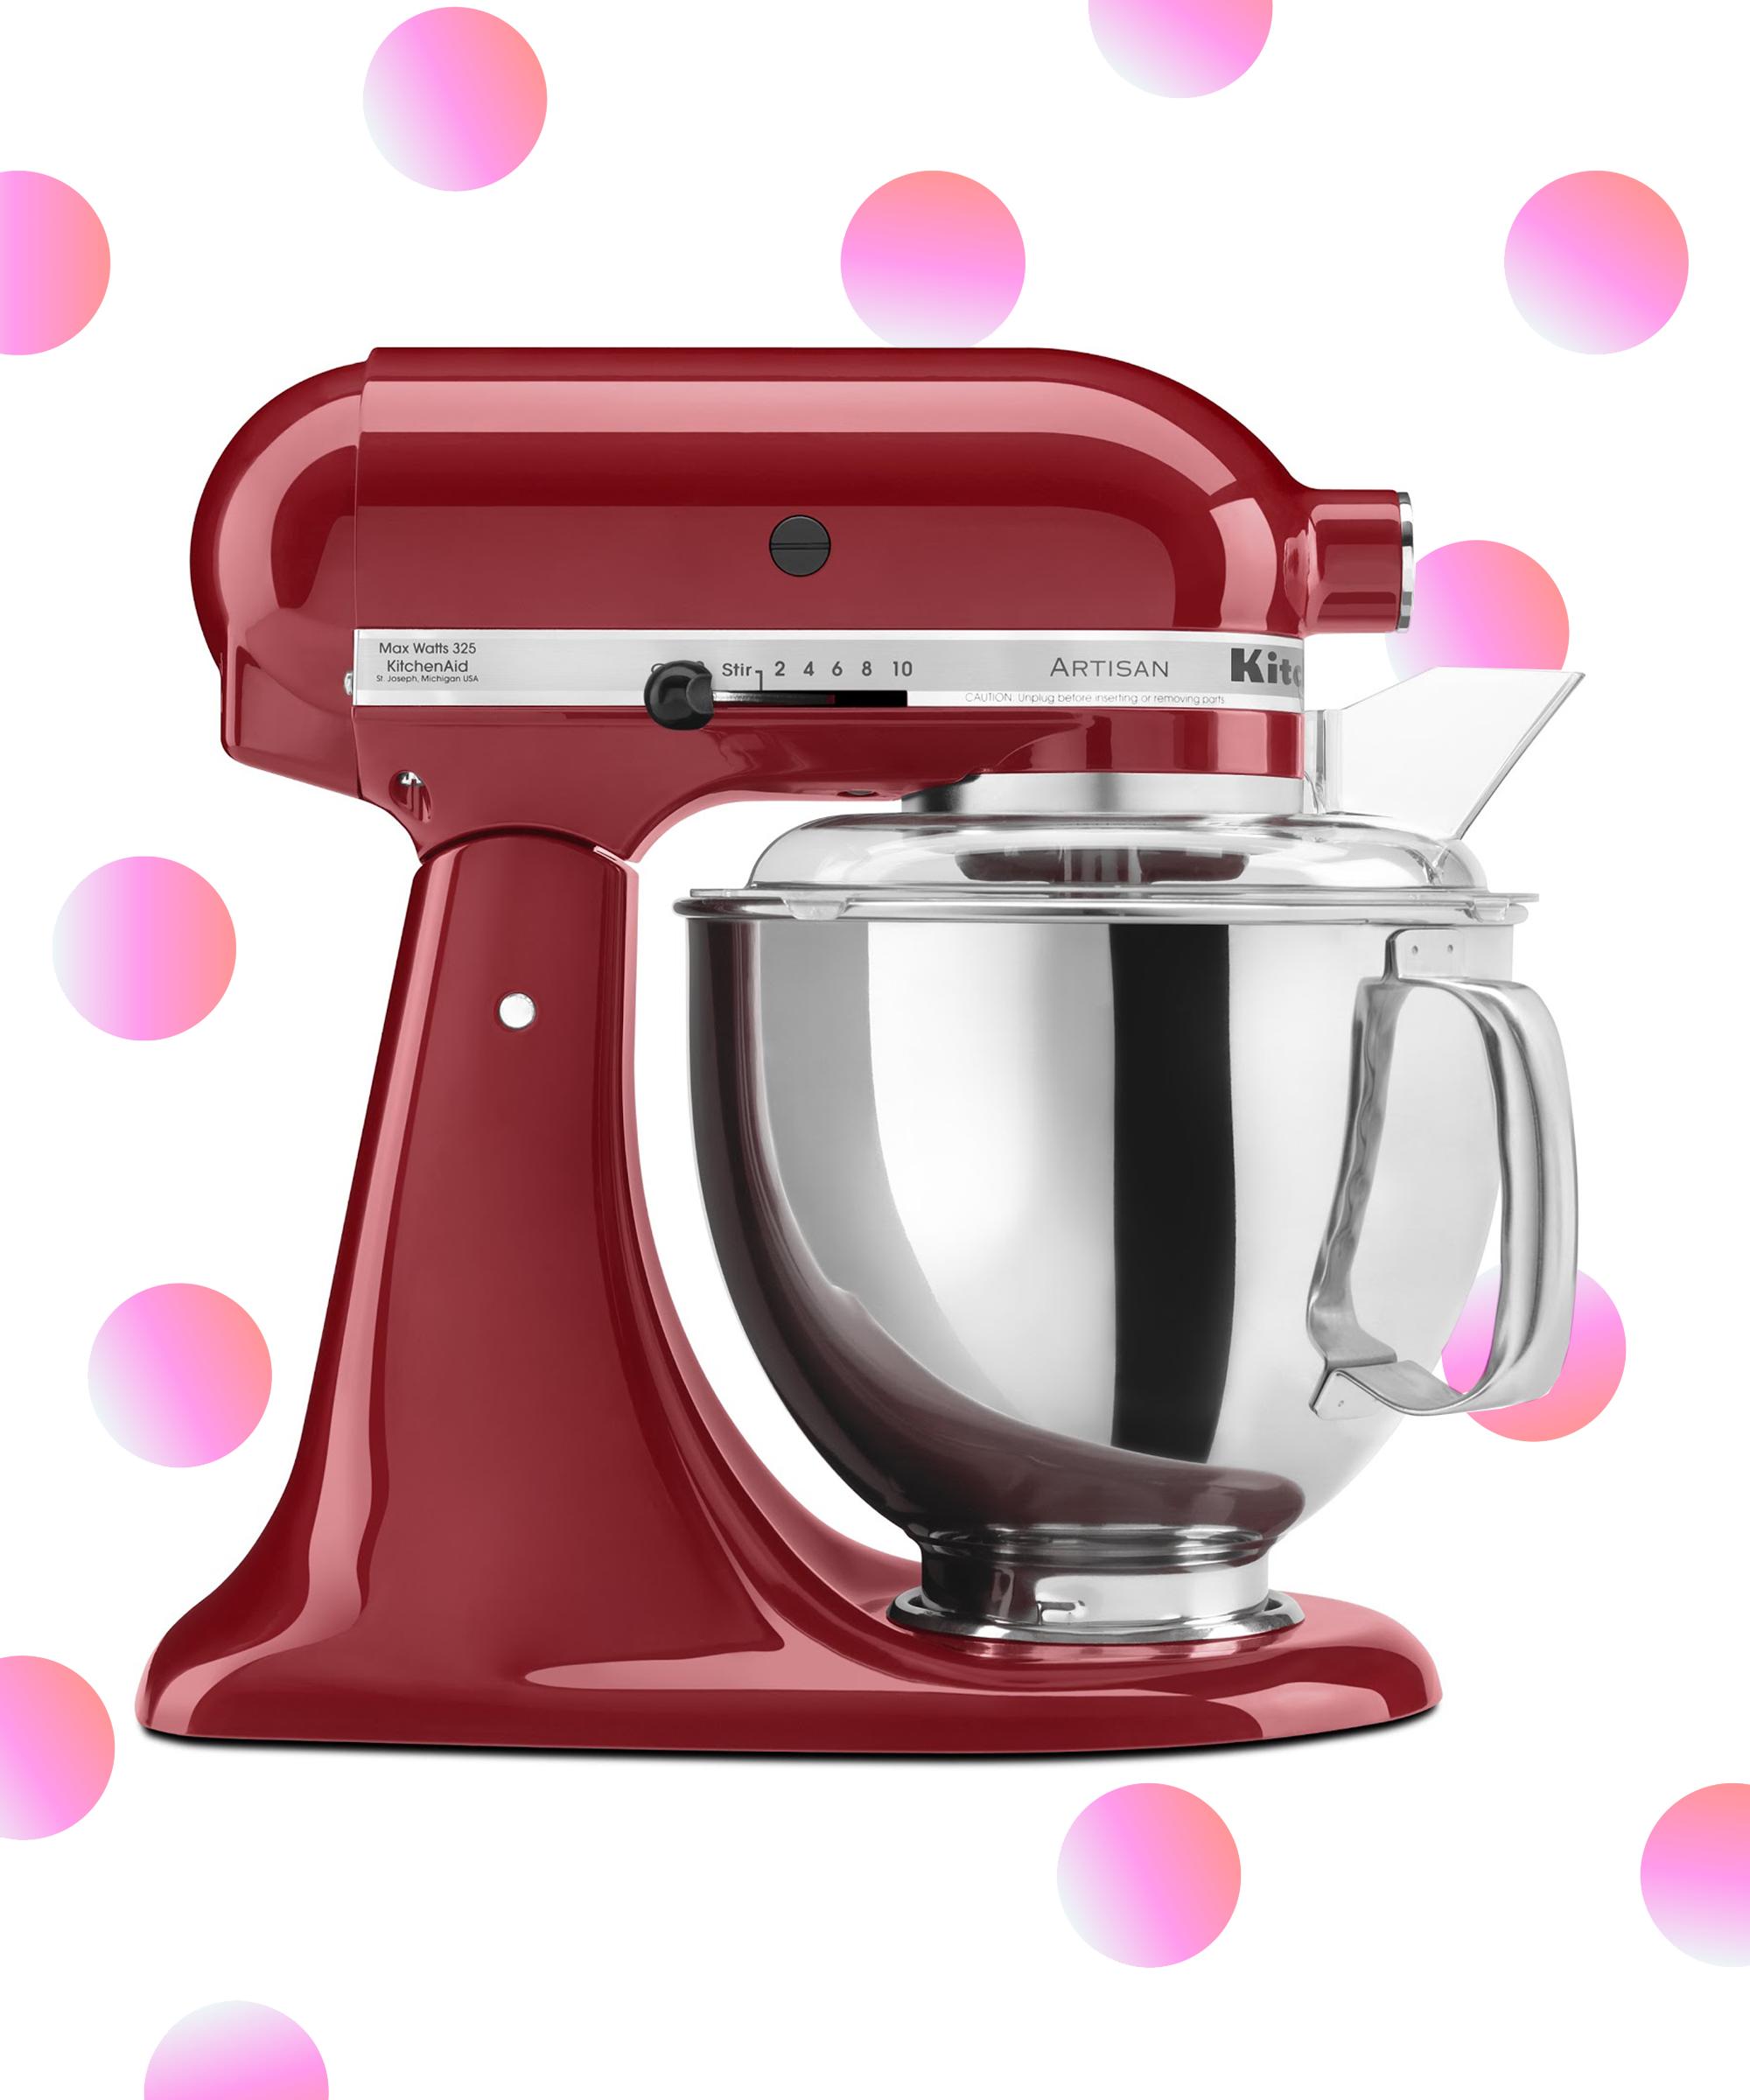 kitchenaid mixer color chart. kitchenaid mixer color chart